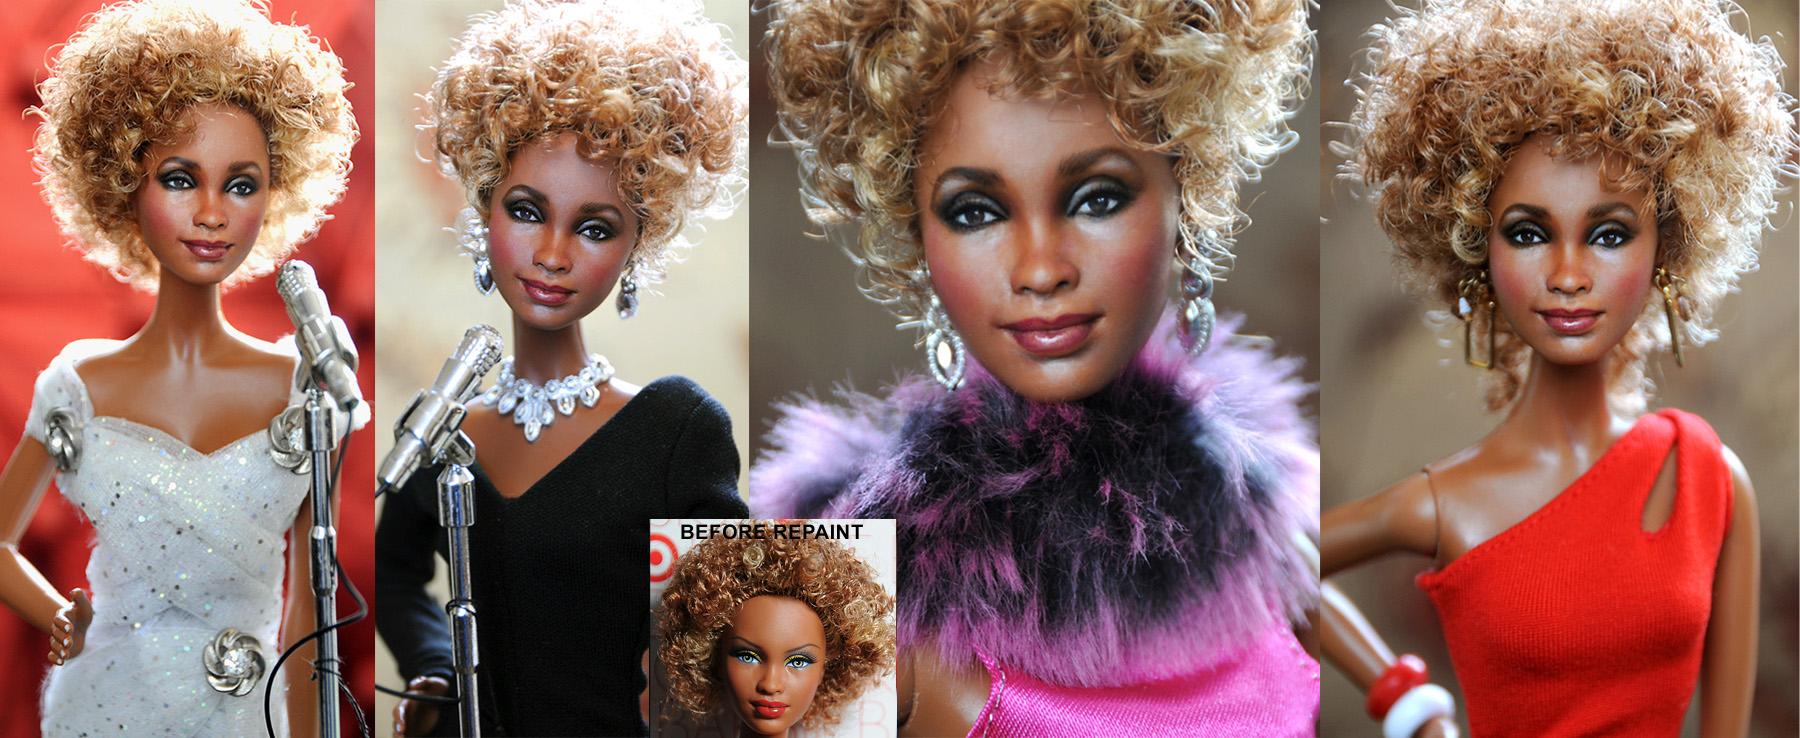 Whitney Houston custom tribute doll repaint by noeling